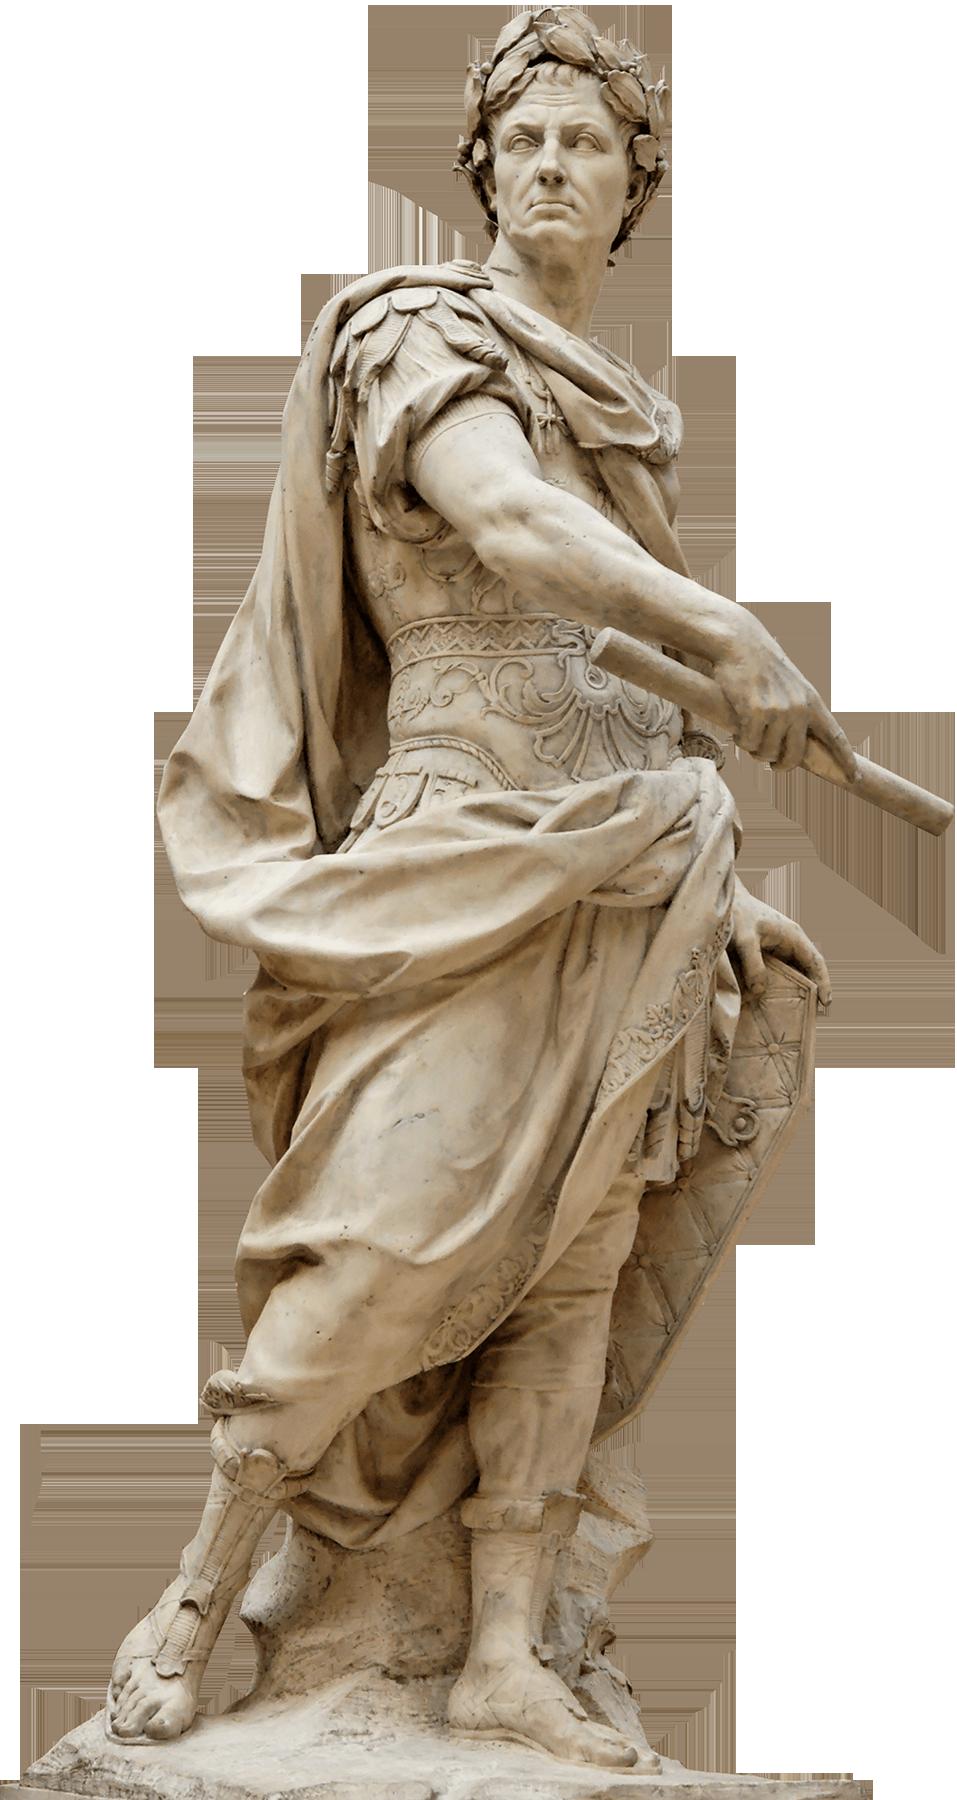 Julius_Caesar_Coustou_Louvre-min 1800.pn